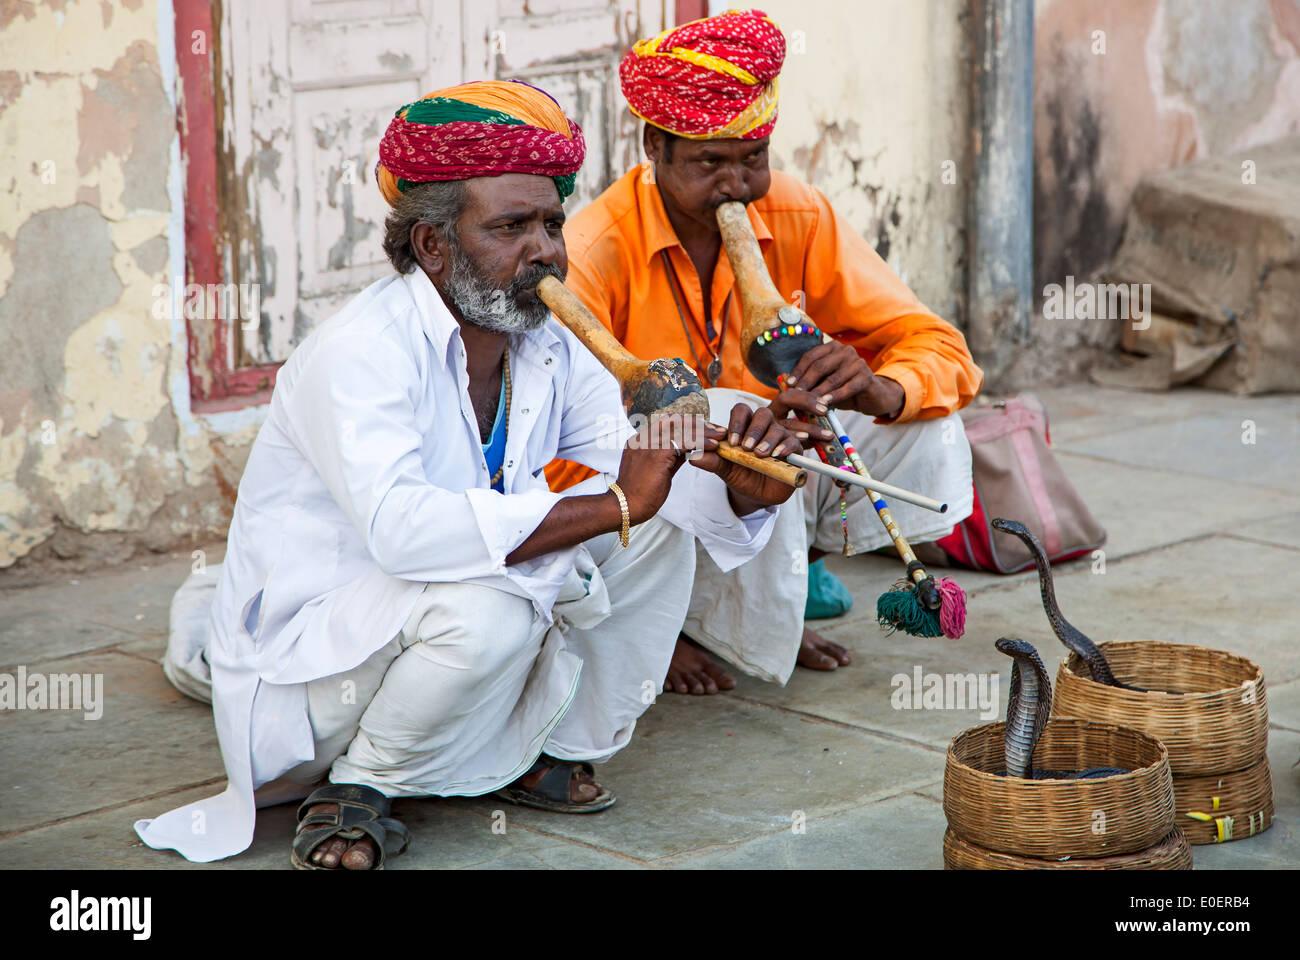 Snake charmers, Jaipur, Rajasthan, India - Stock Image